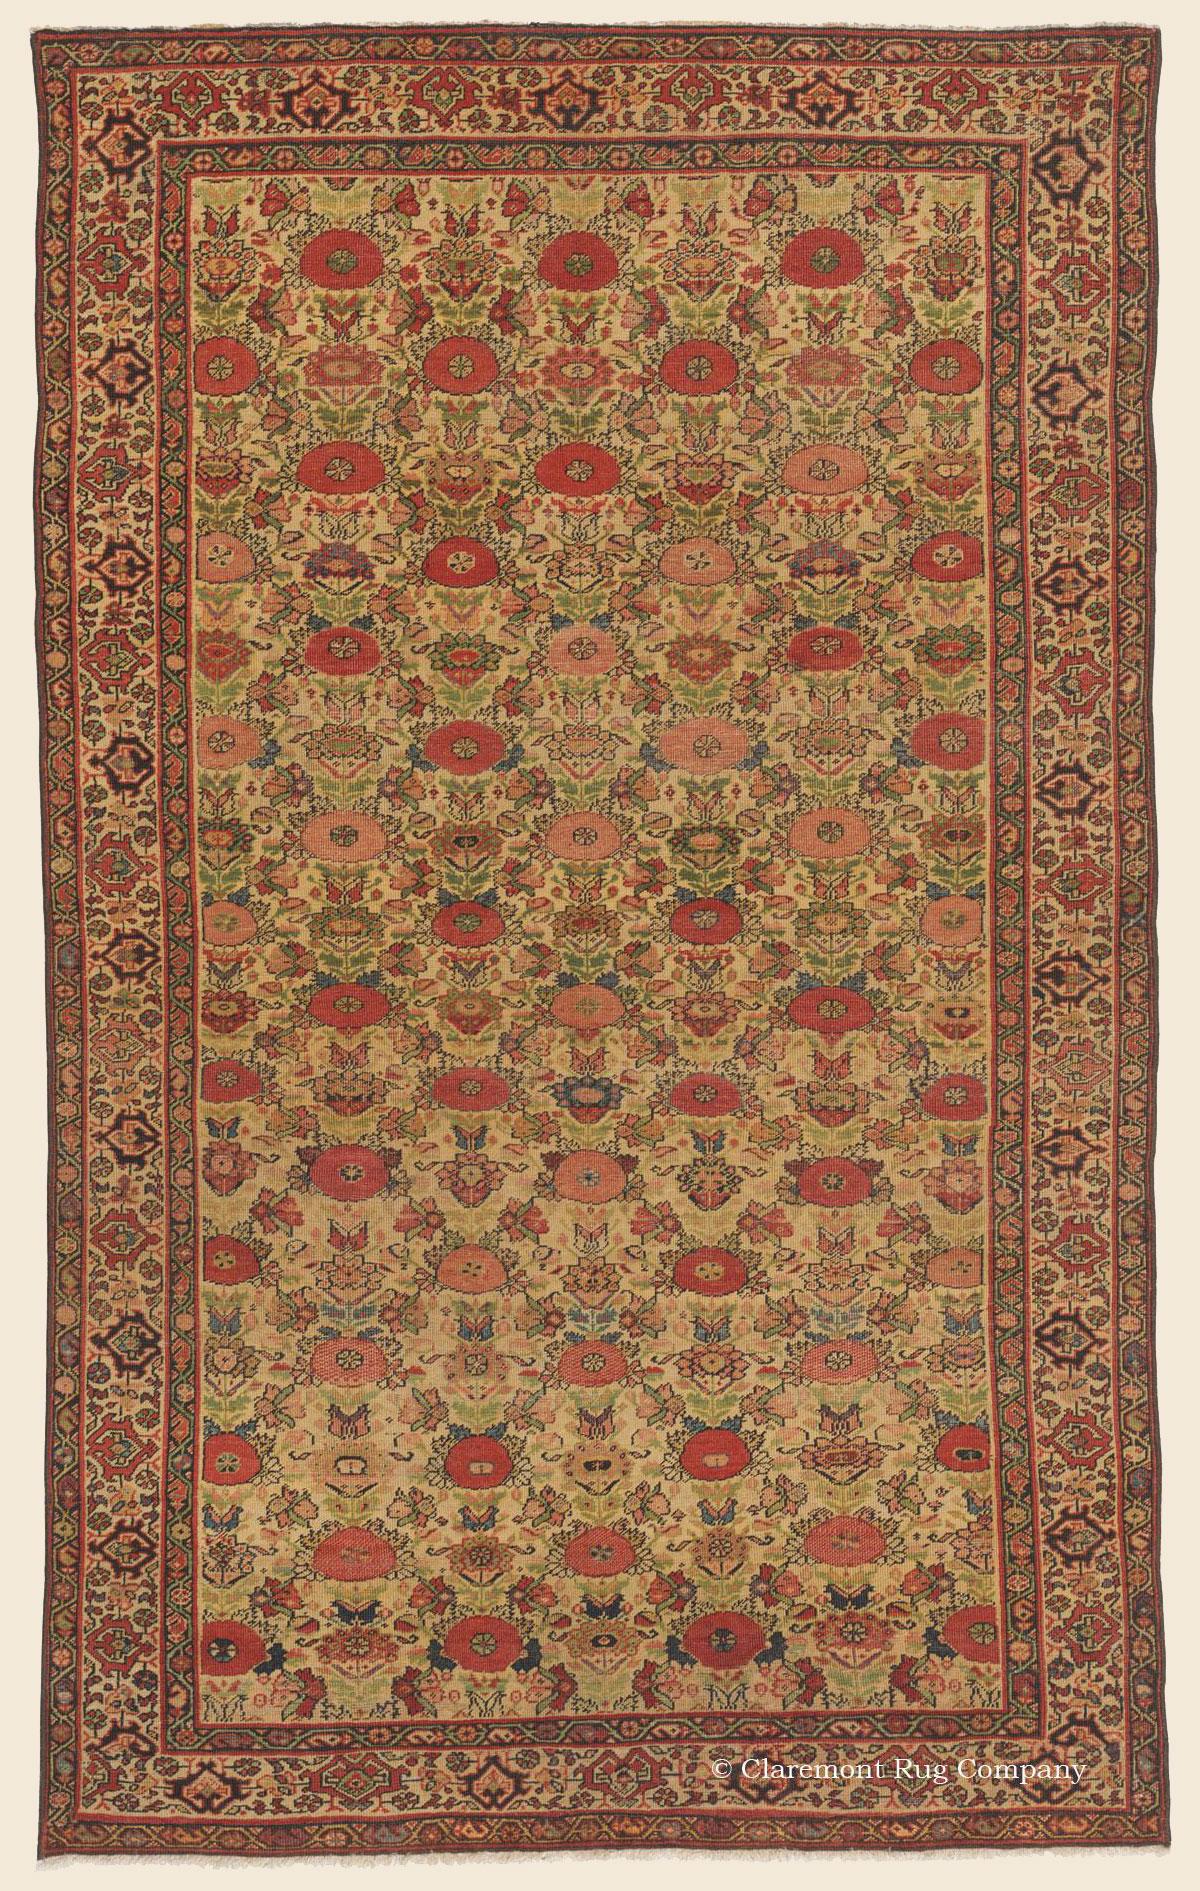 Ferahan Quot Blossom Rug Quot West Central Persian Antique Rug